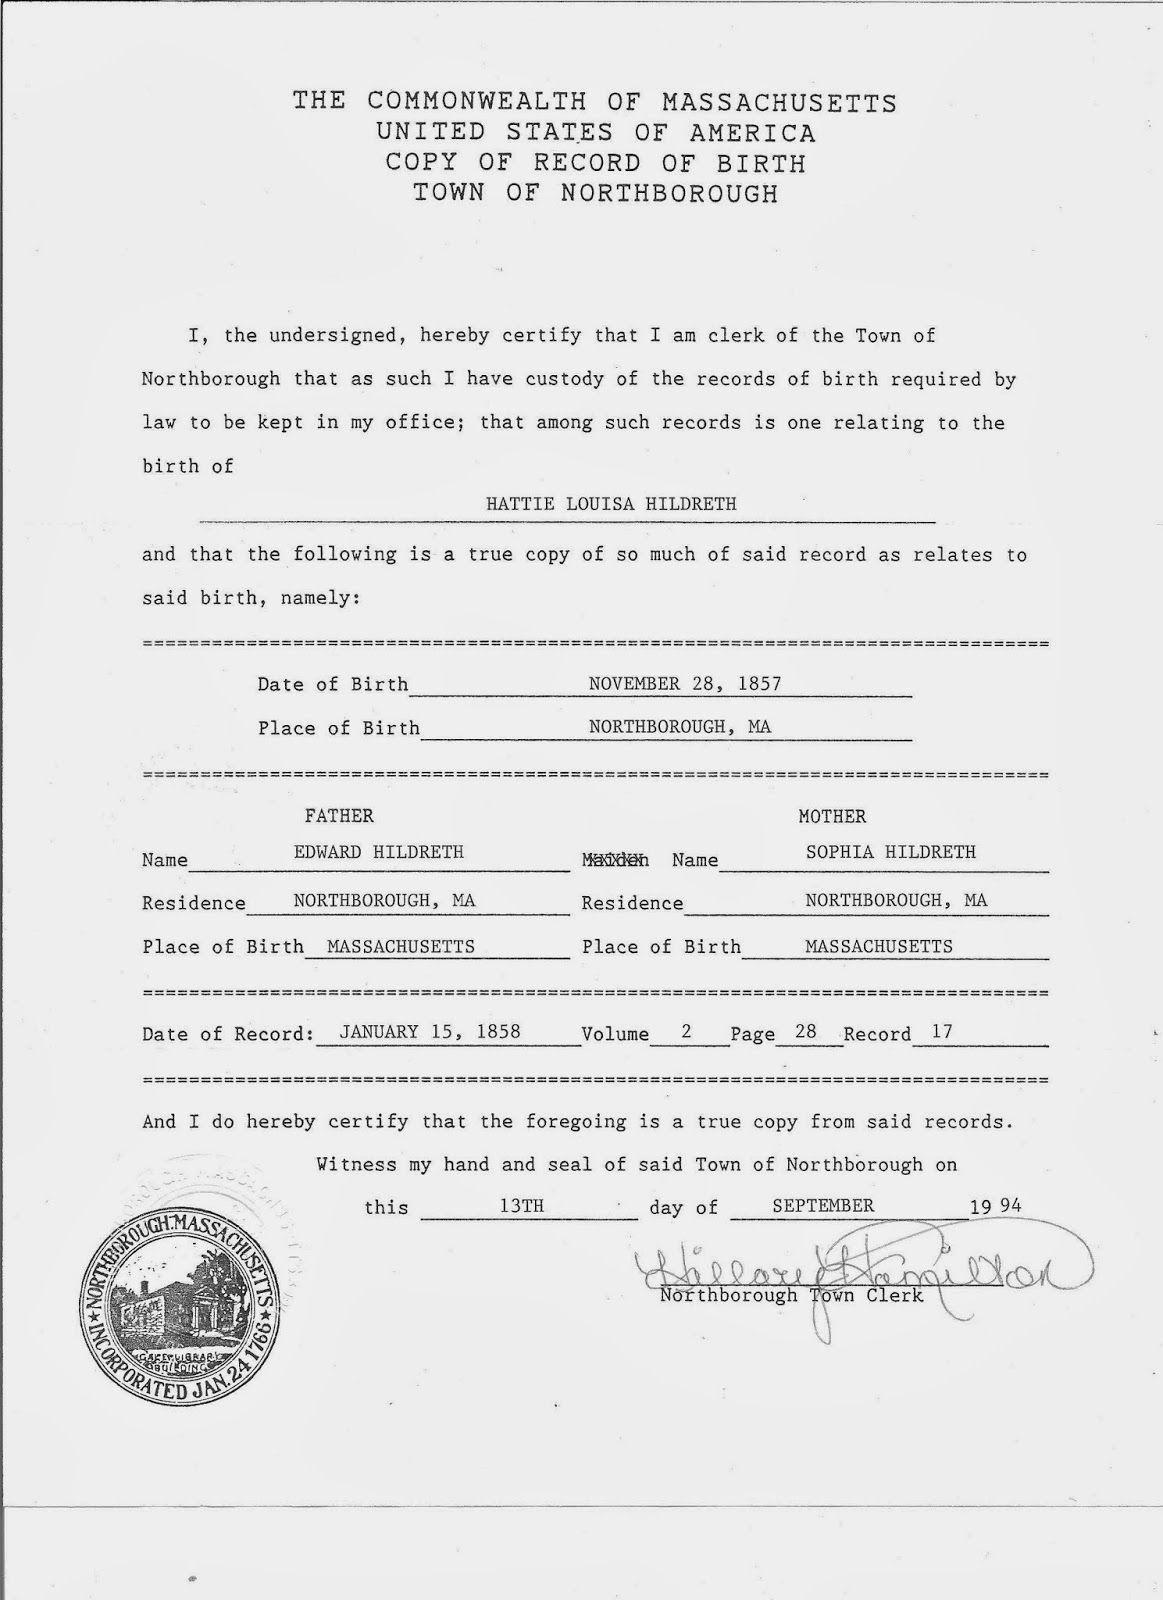 Genea musings treasure chest thursday birth certificate for genea musings treasure chest thursday birth certificate for hattie louisa hildreth born aiddatafo Gallery